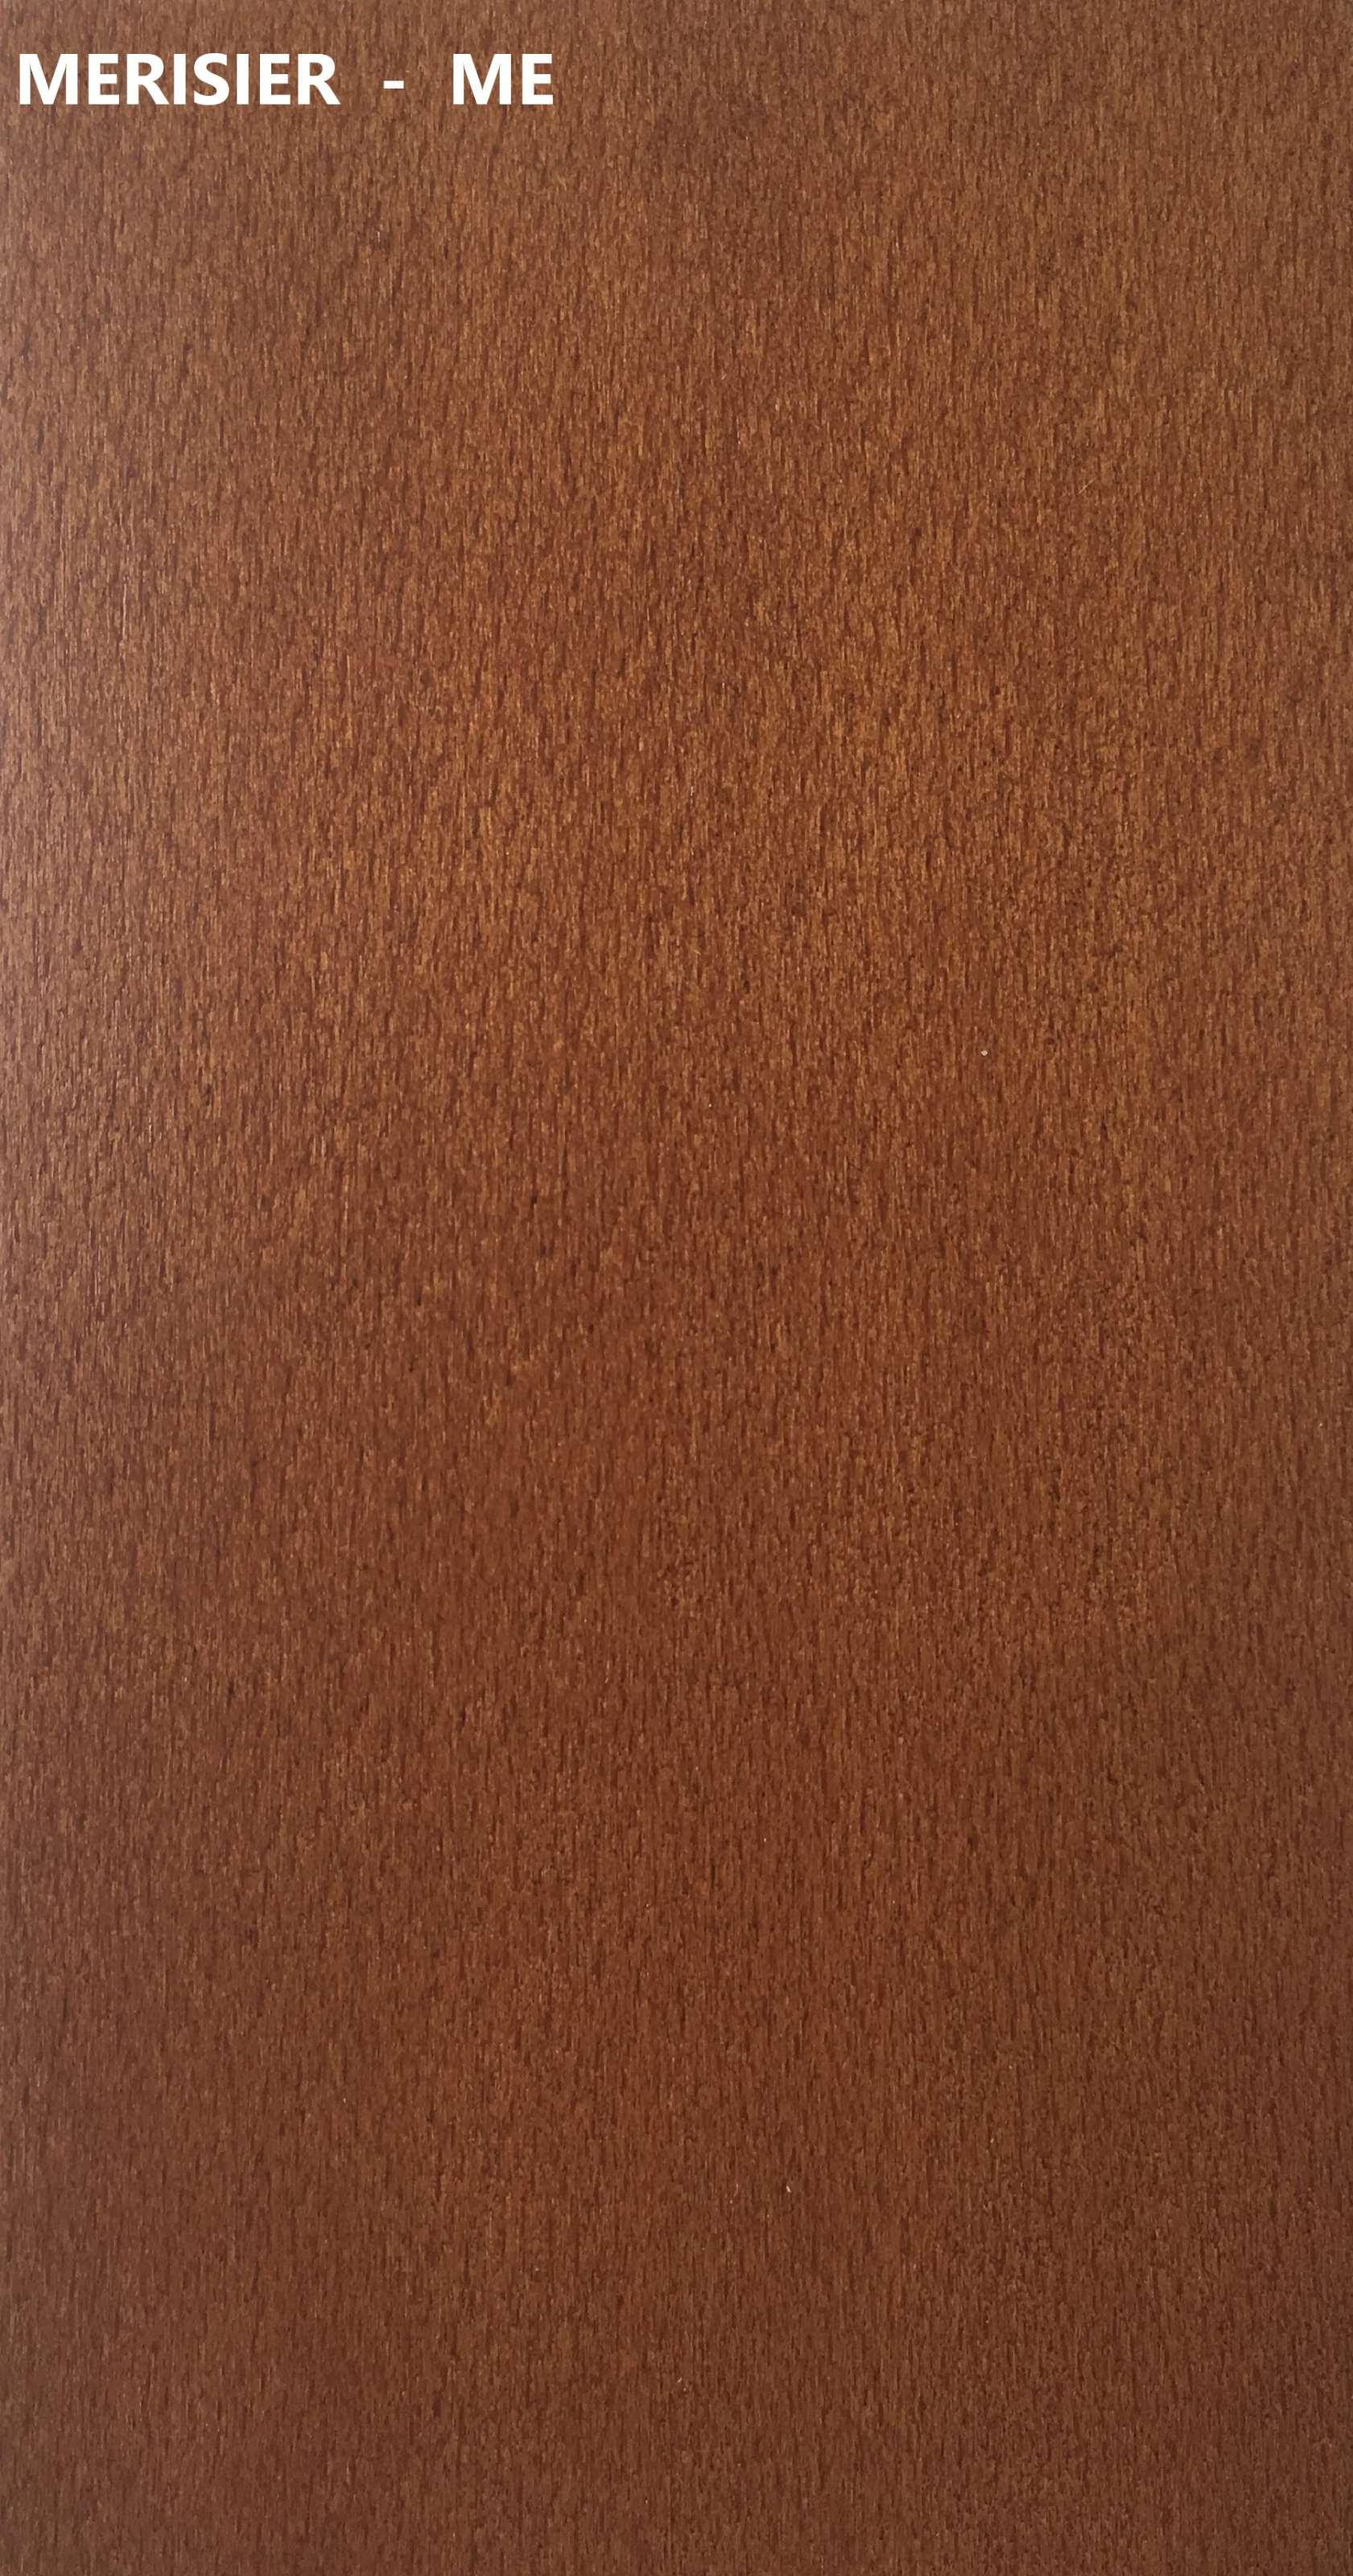 Merisier - Made in France - Uncoqdansletransat